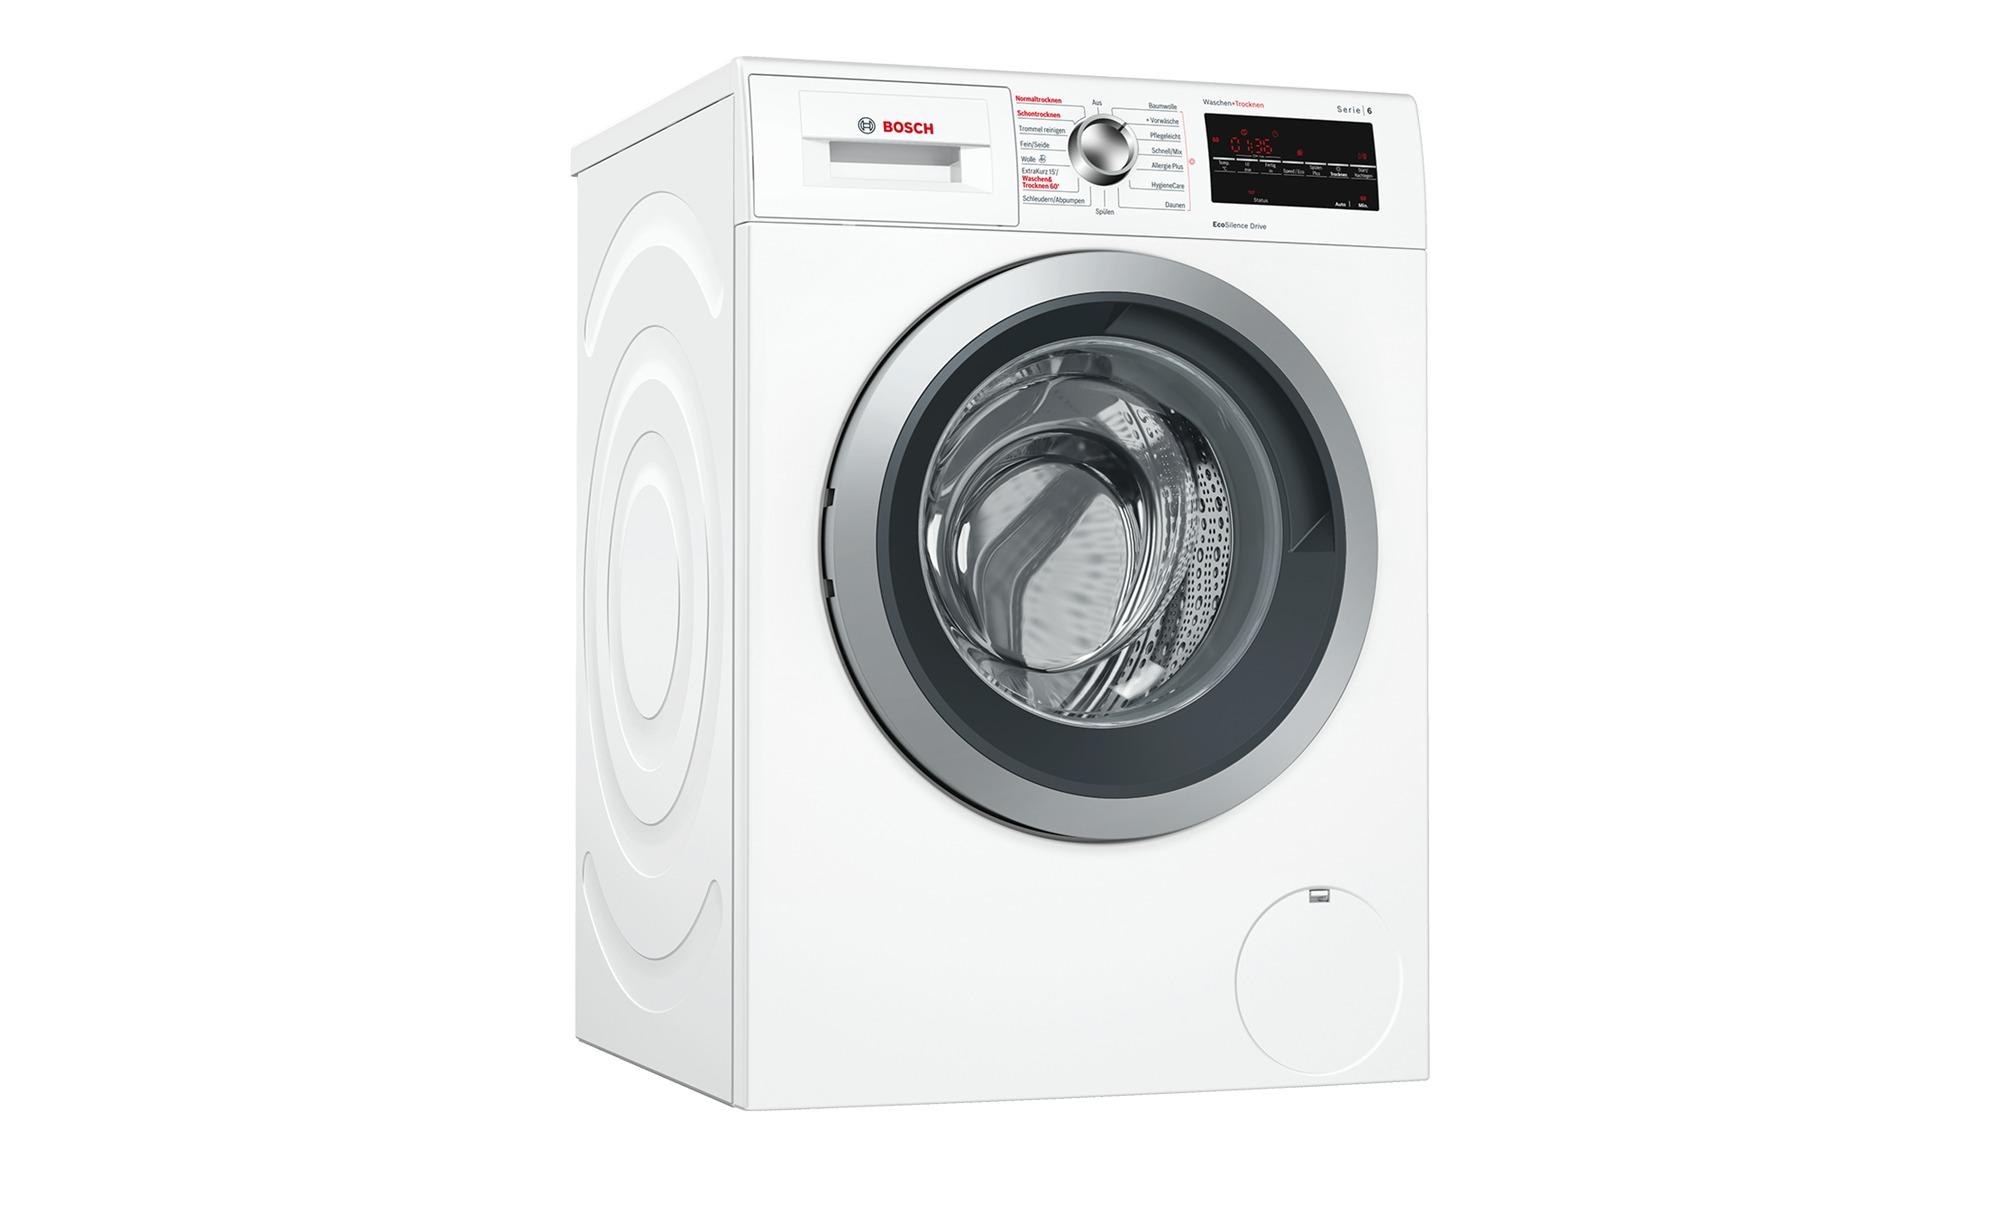 Bosch Kühlschrank Kgn 33 48 : Bosch waschtrockner wvg möbel höffner